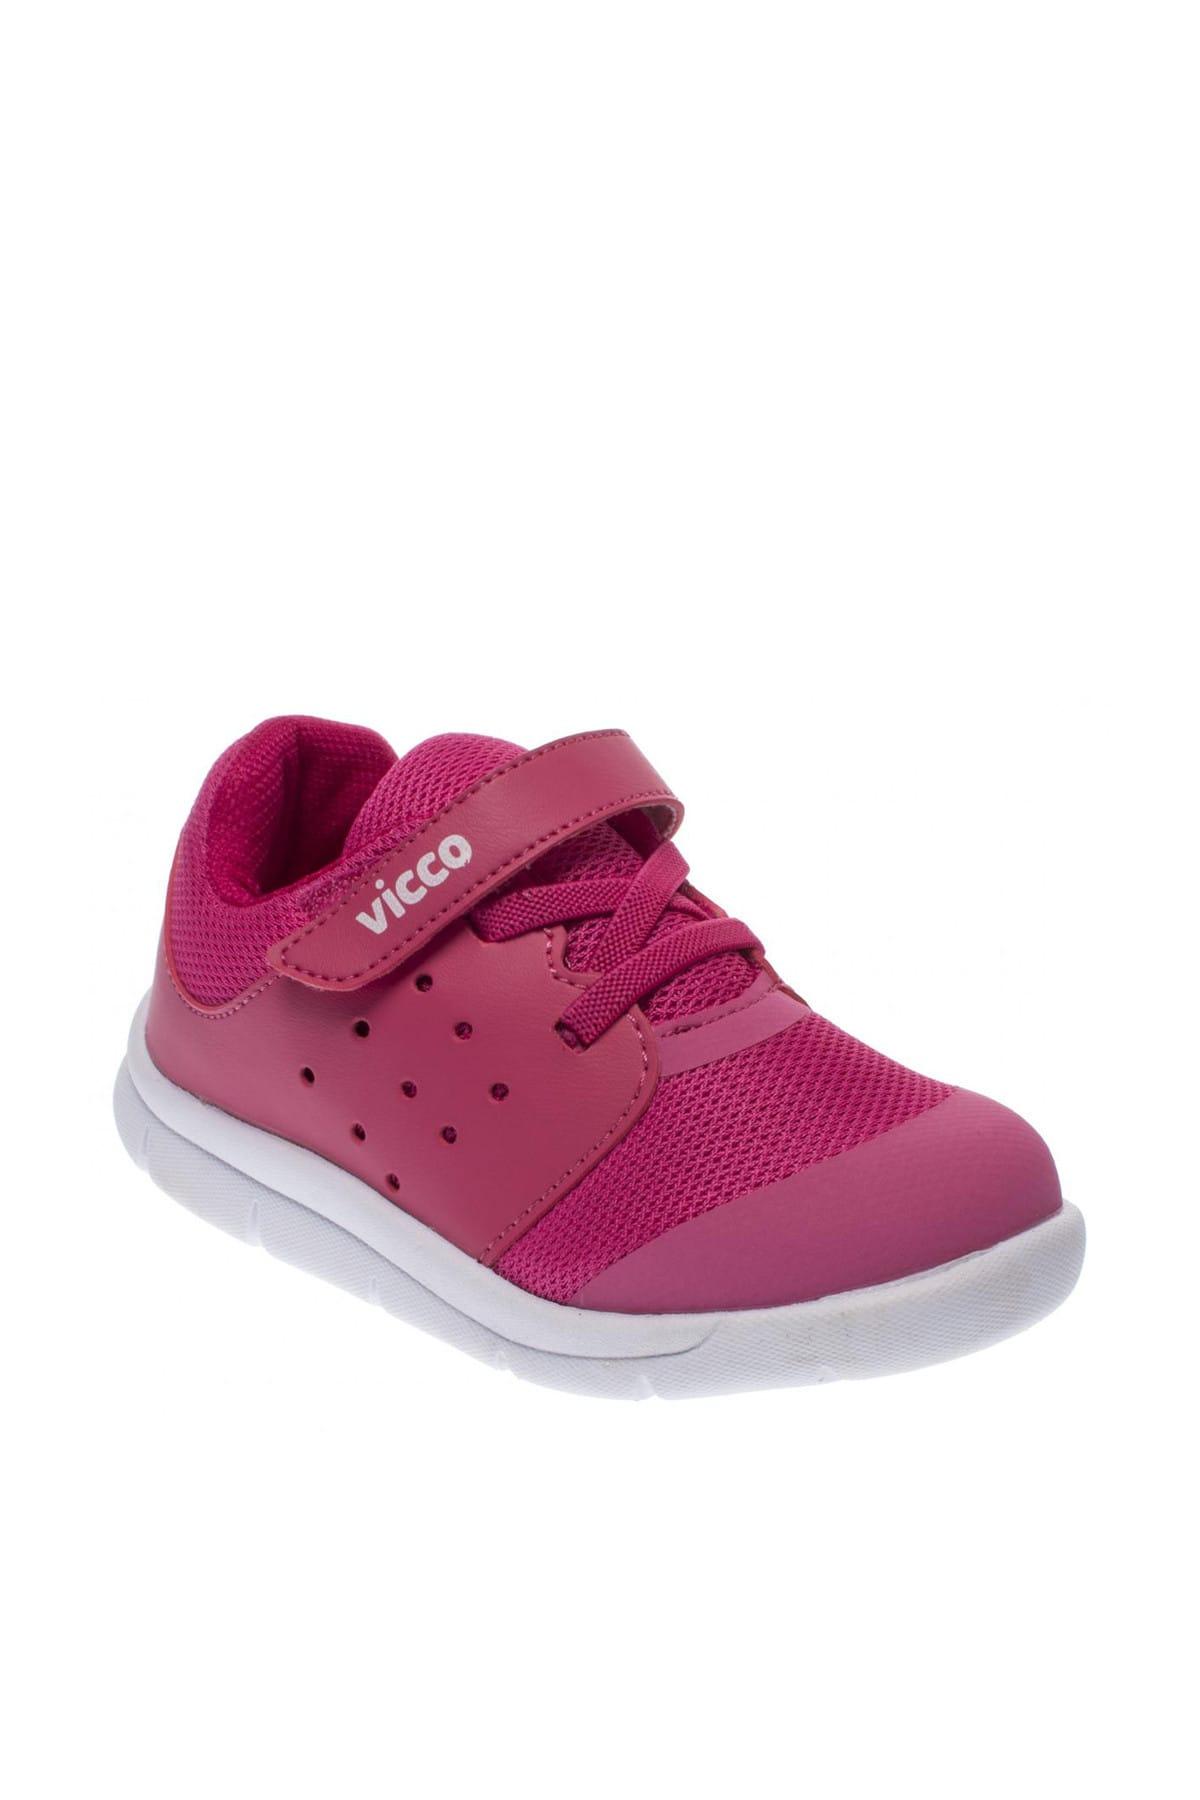 Vicco Fuşya Çocuk Sneaker 211 347.19Y191P 1